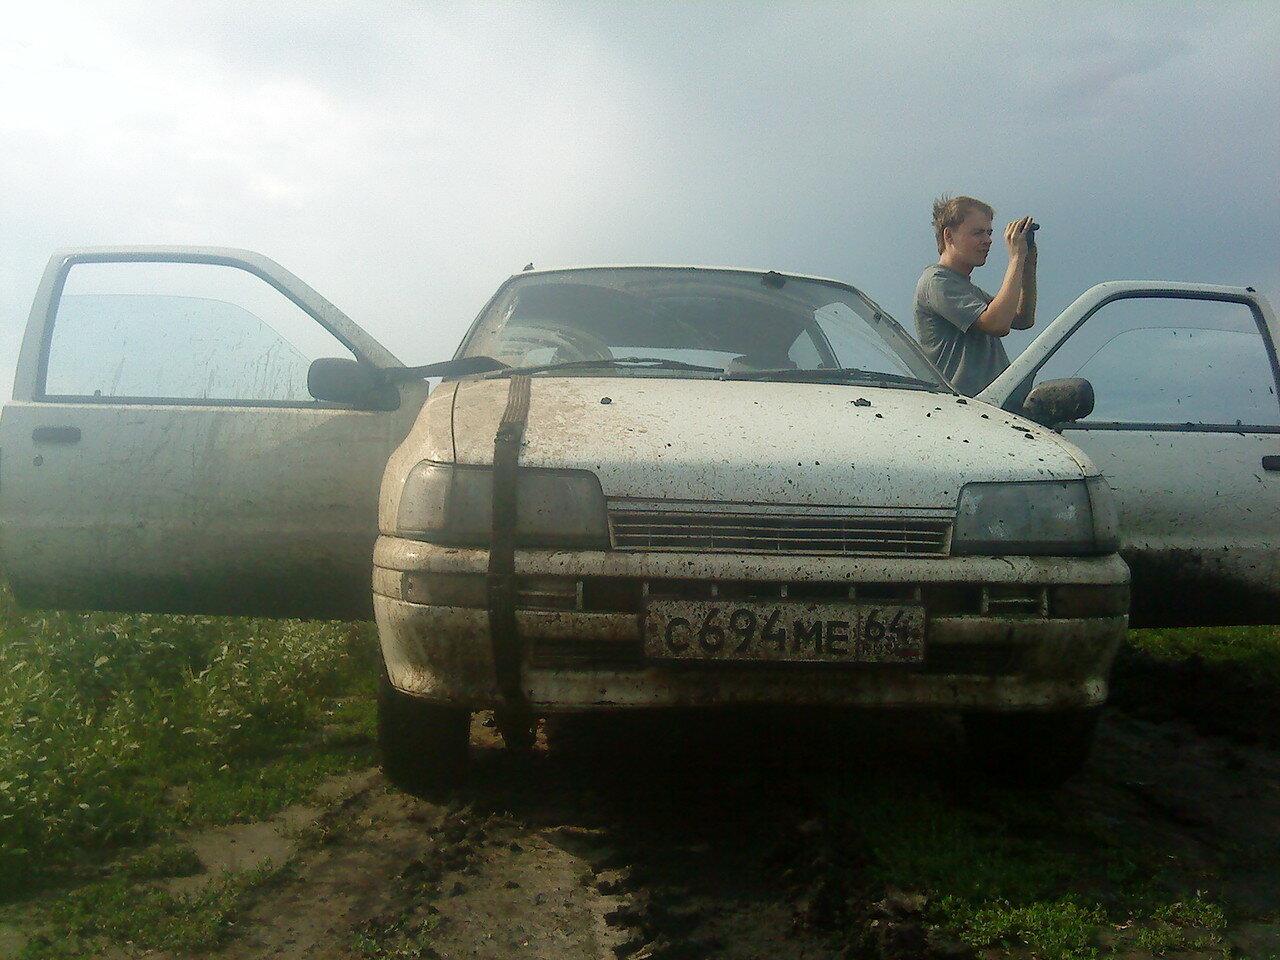 img-fotki.yandex.ru/get/16116/127324658.2/0_11a138_48008d90_XXXL.jpg